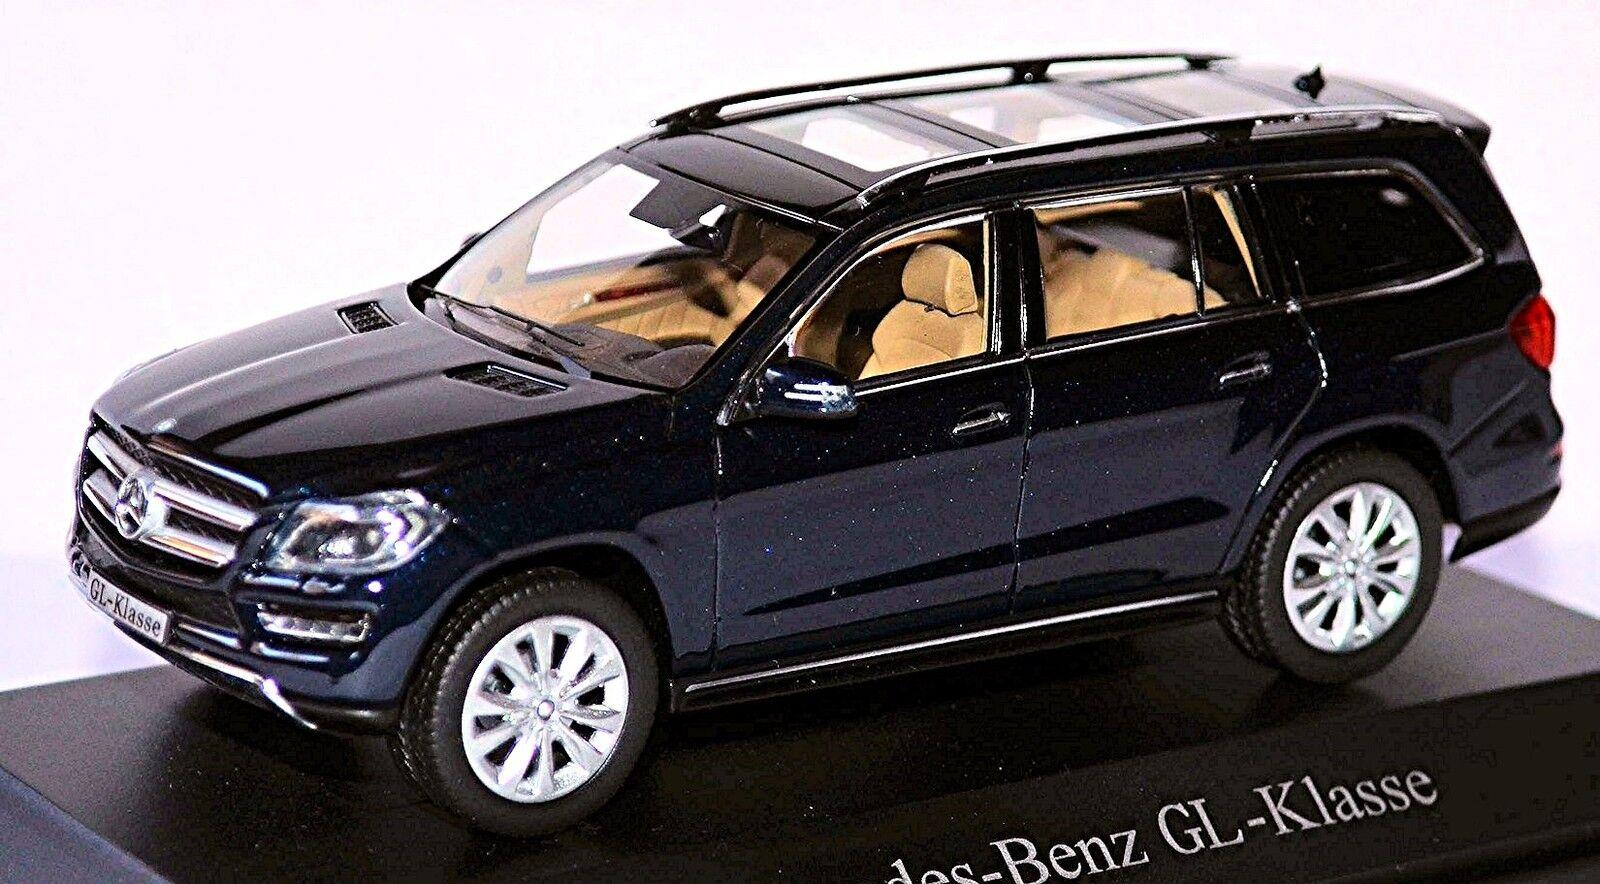 Mercedes Gl Class X166 SUV 2012-15 Cavancita Azul Metalizado Metalizado Metalizado 1 43 Norev 4f9f36